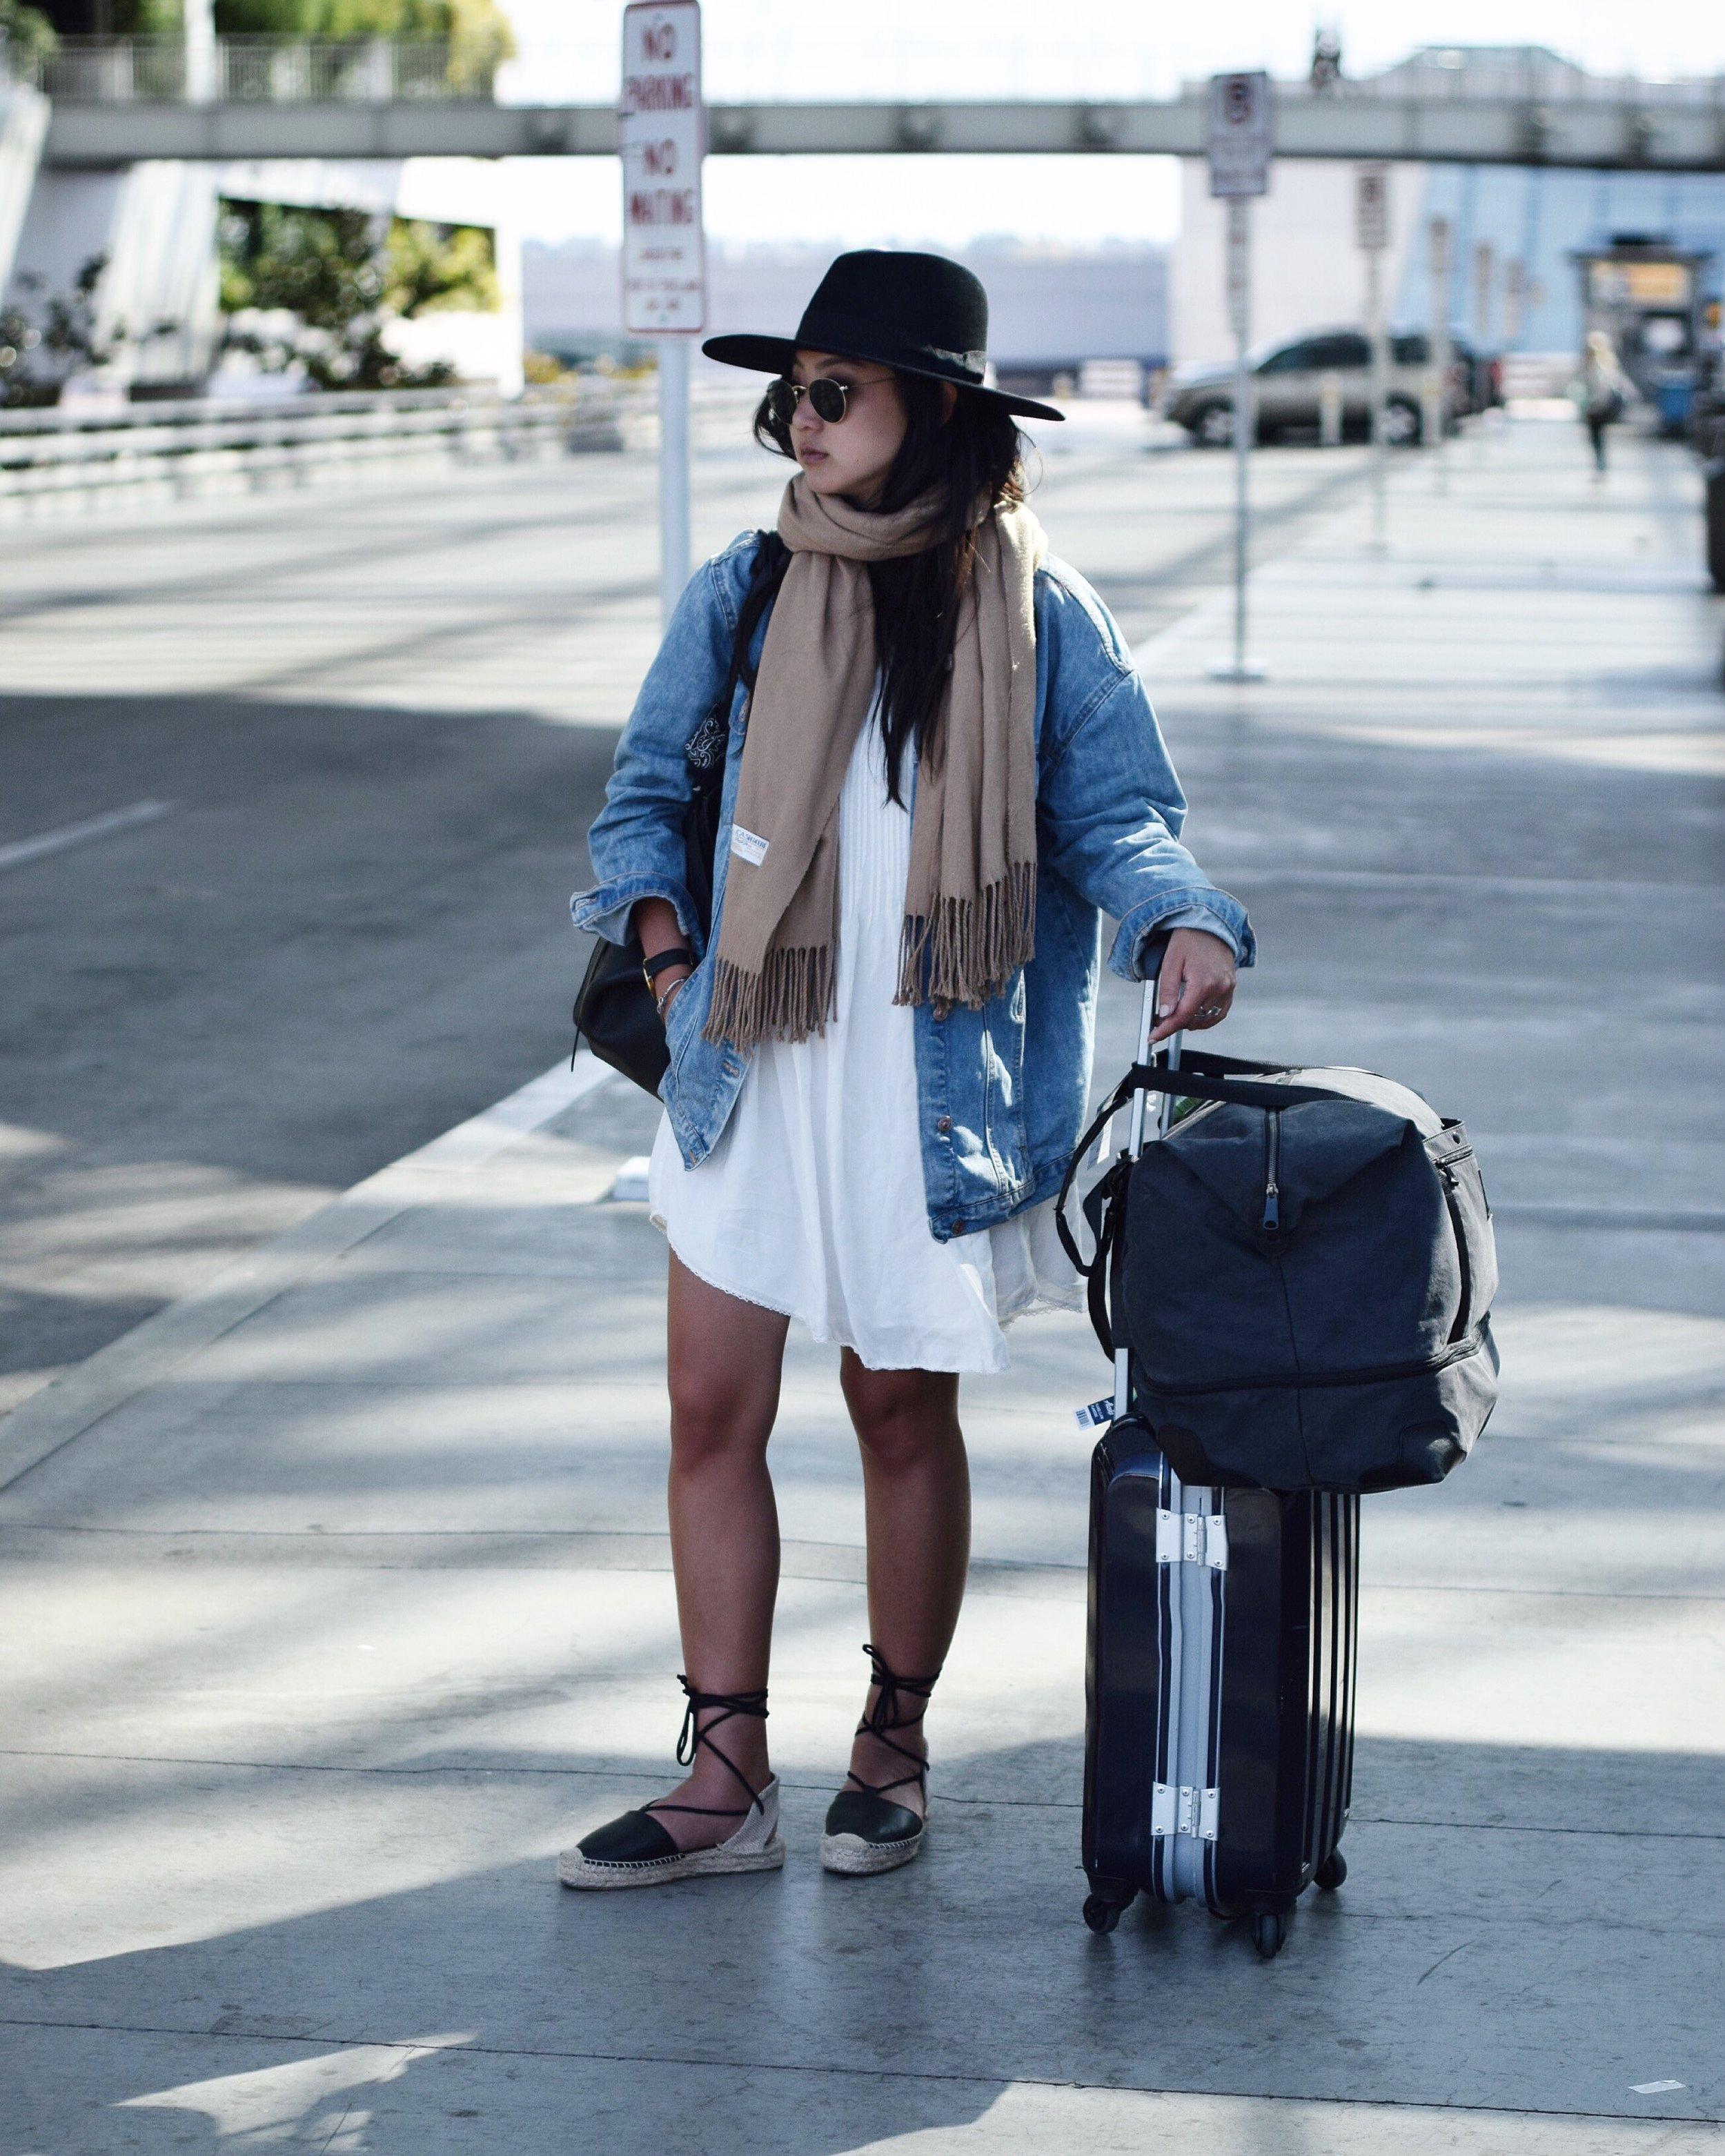 ARITZIA  dress  / ZARA  denim jacket  / SOLUDOS   sandals   / BRIXTON   hat